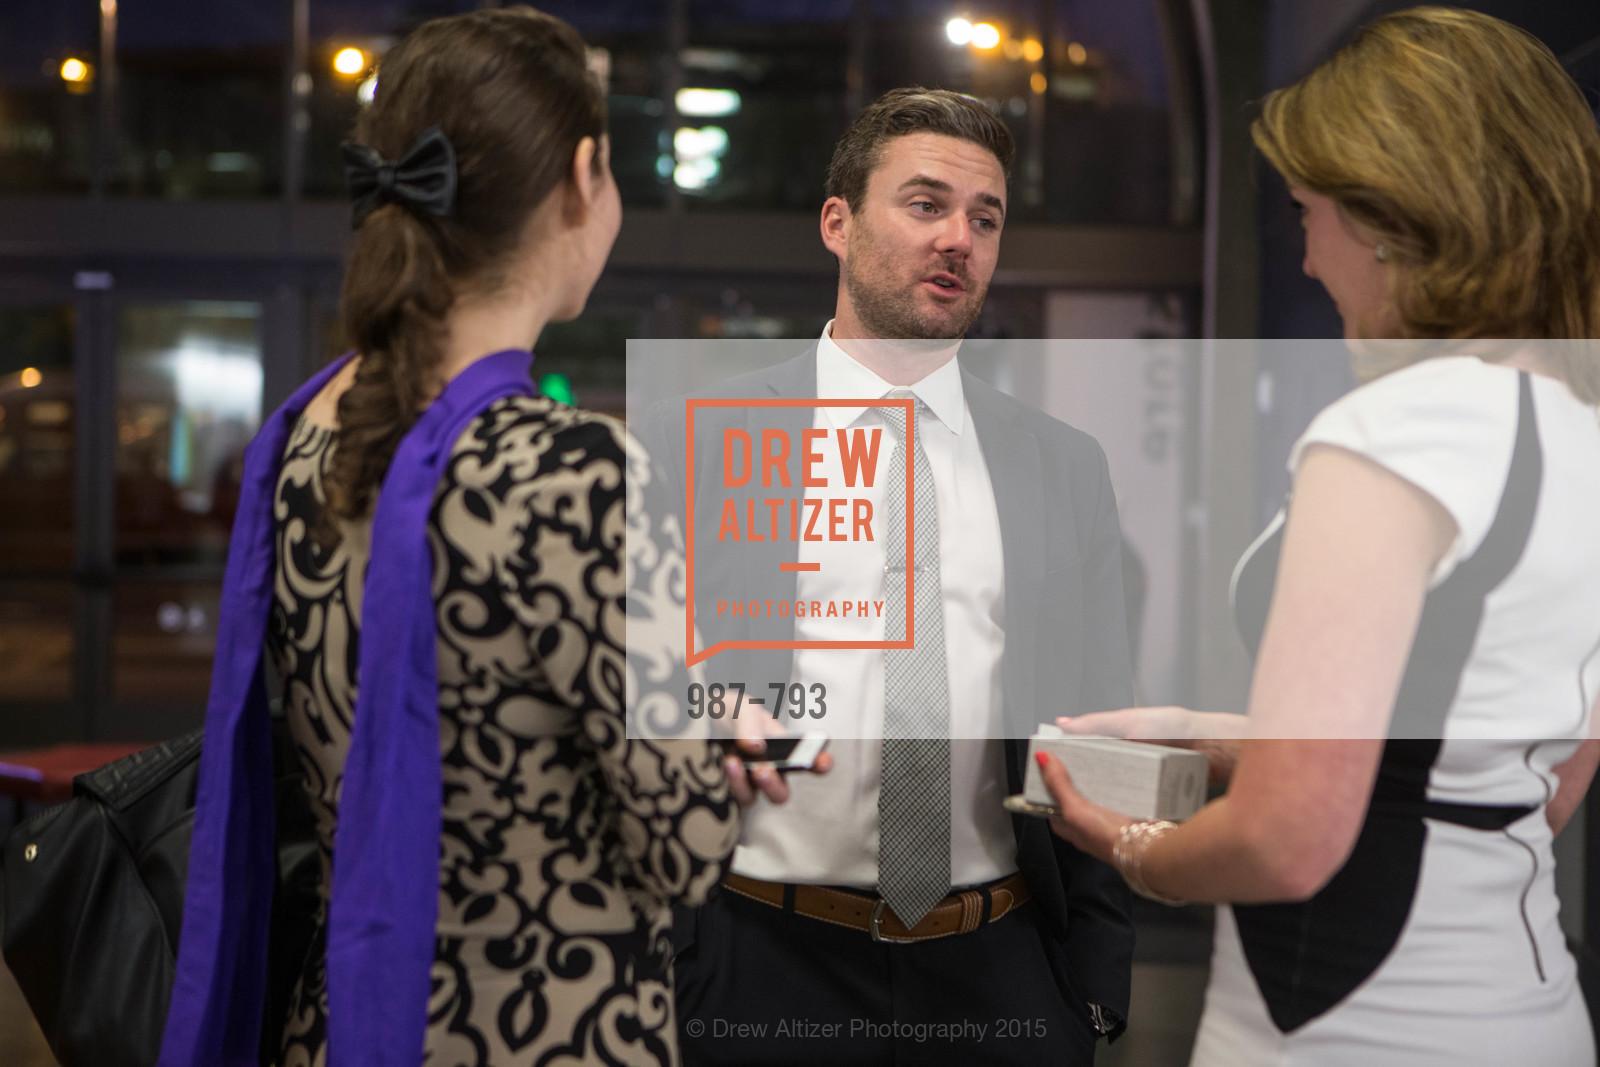 Benjamin Osgood, SF BRAVO CLUB Sneak Peek at the EXPLORATORIUM, US, April 22nd, 2015,Drew Altizer, Drew Altizer Photography, full-service agency, private events, San Francisco photographer, photographer california